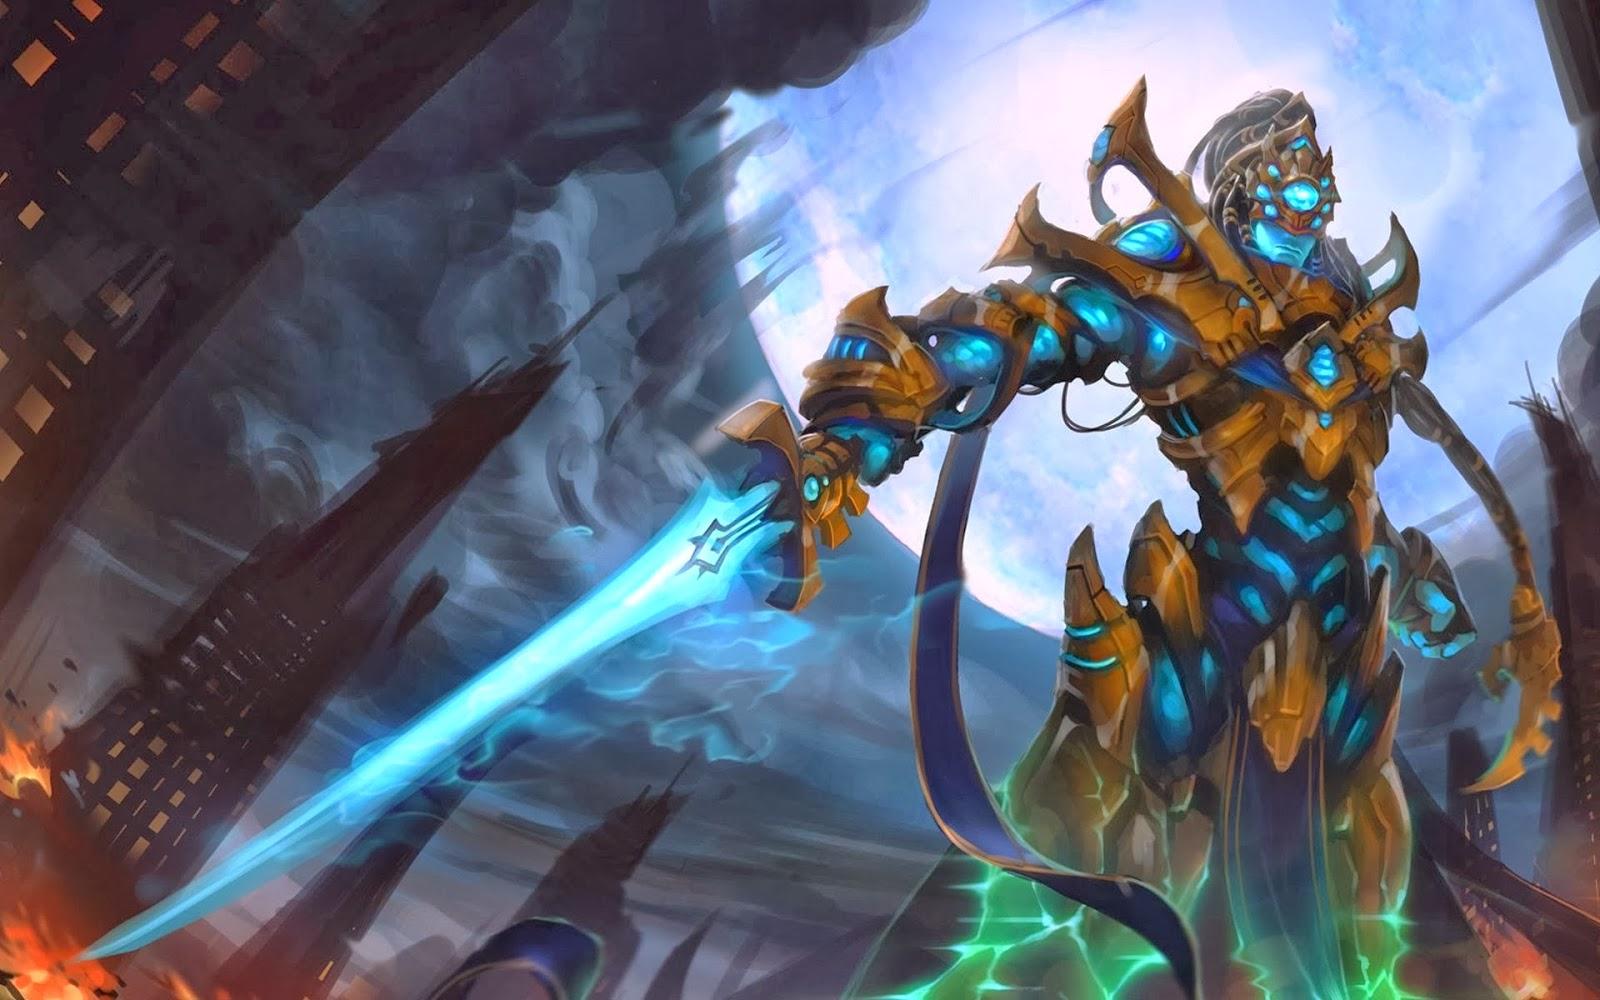 World Of Warcraft Wallpapers Hd Master Yi League Of Legends Wallpaper Master Yi Desktop